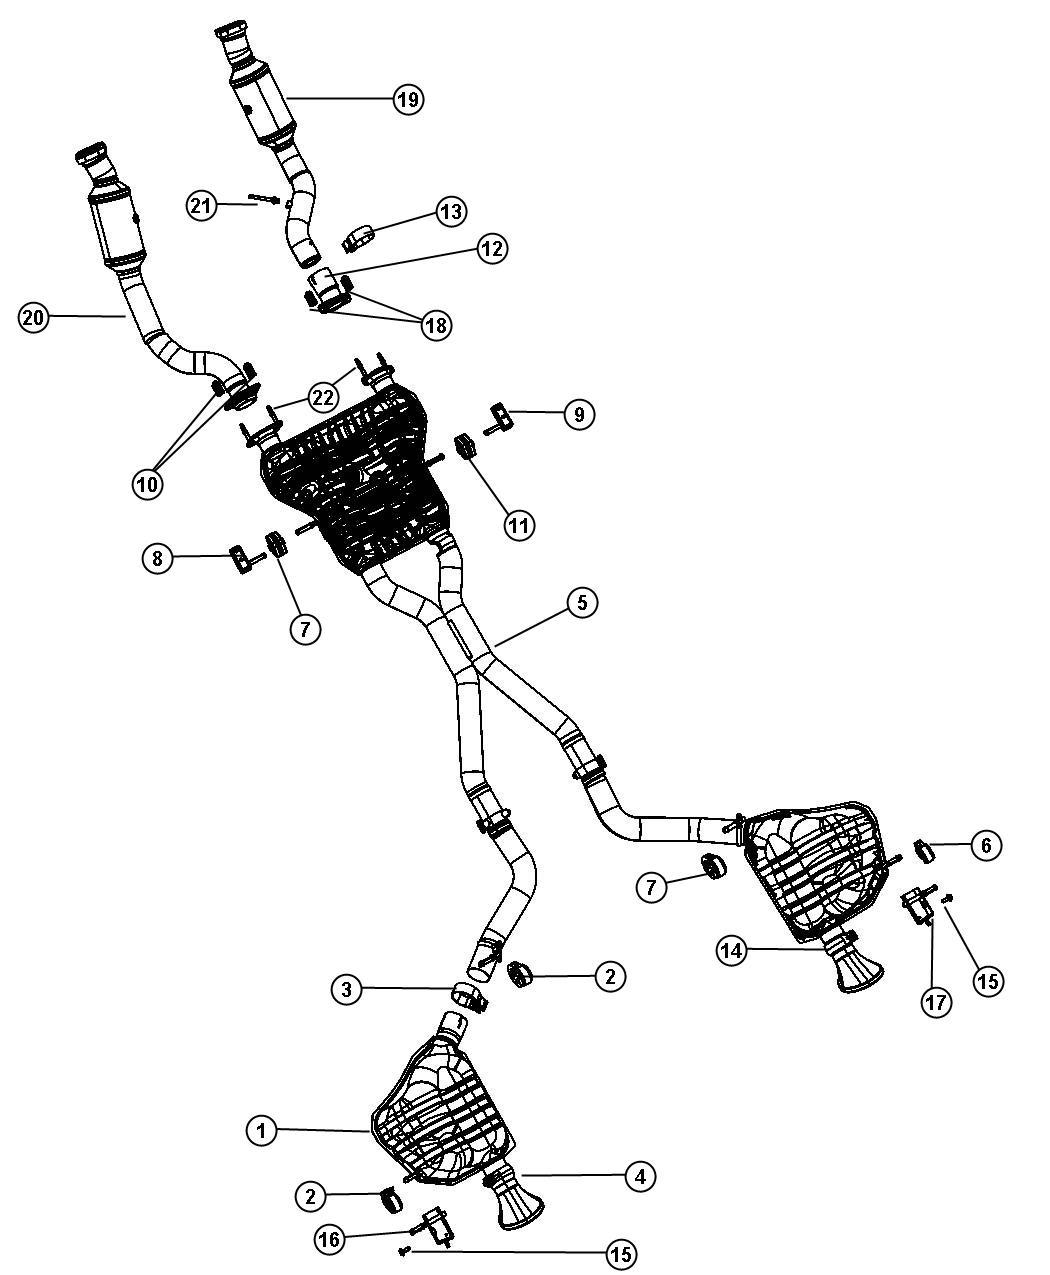 2014 jeep grand cherokee resonator and pipe  right